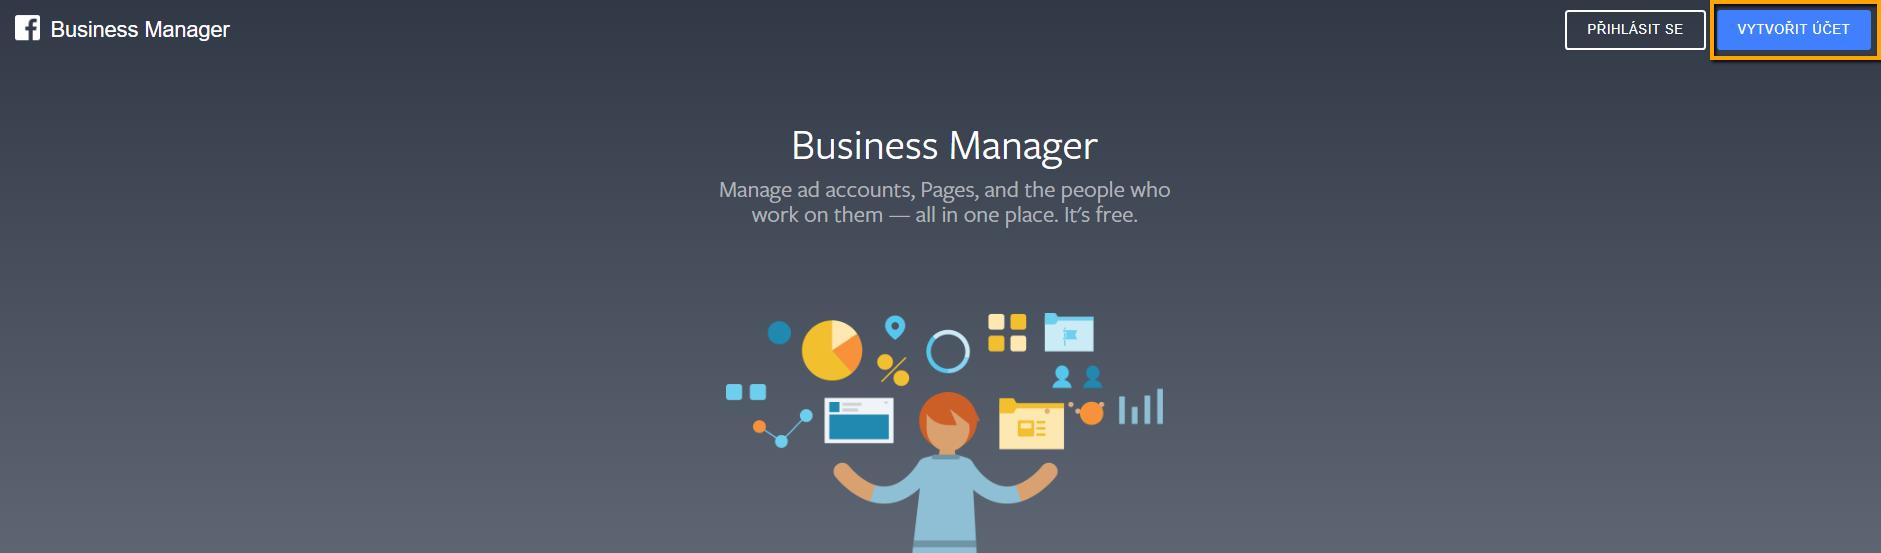 Tvorba účtu v Business Manageru